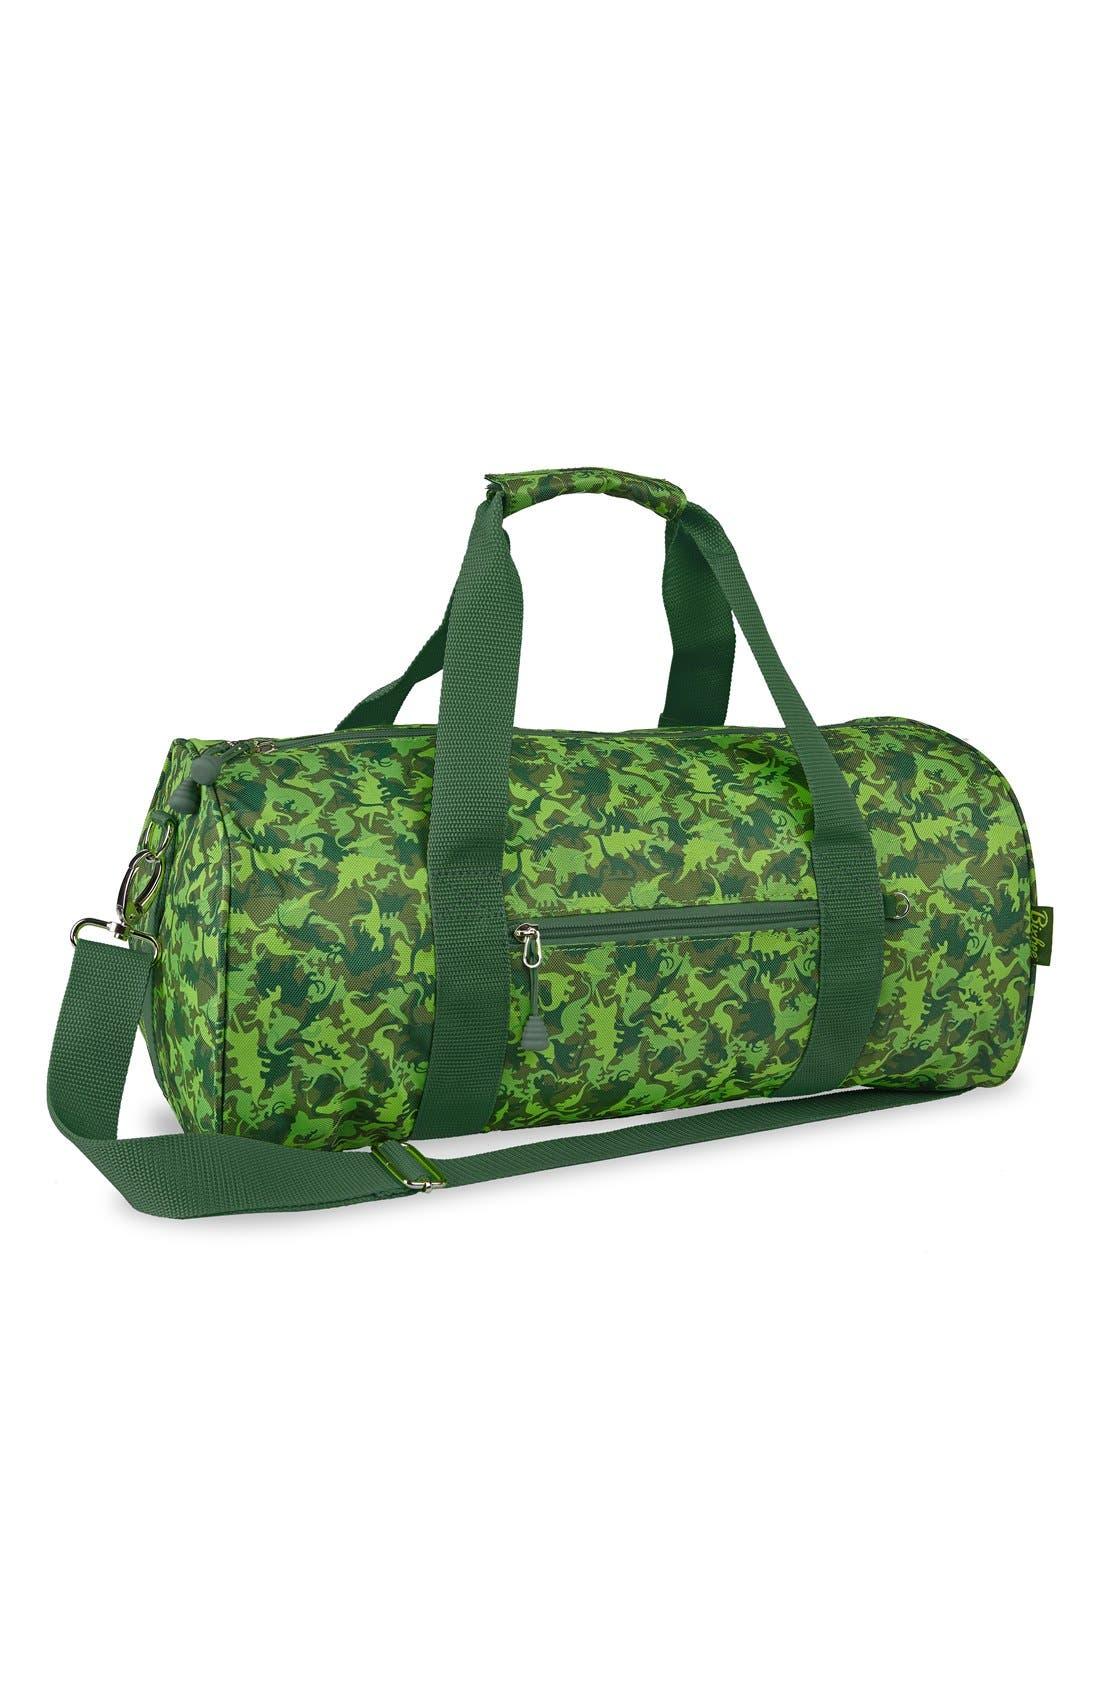 Bixbee 'Large Dino Camo' Sports Duffel Bag (Boys)